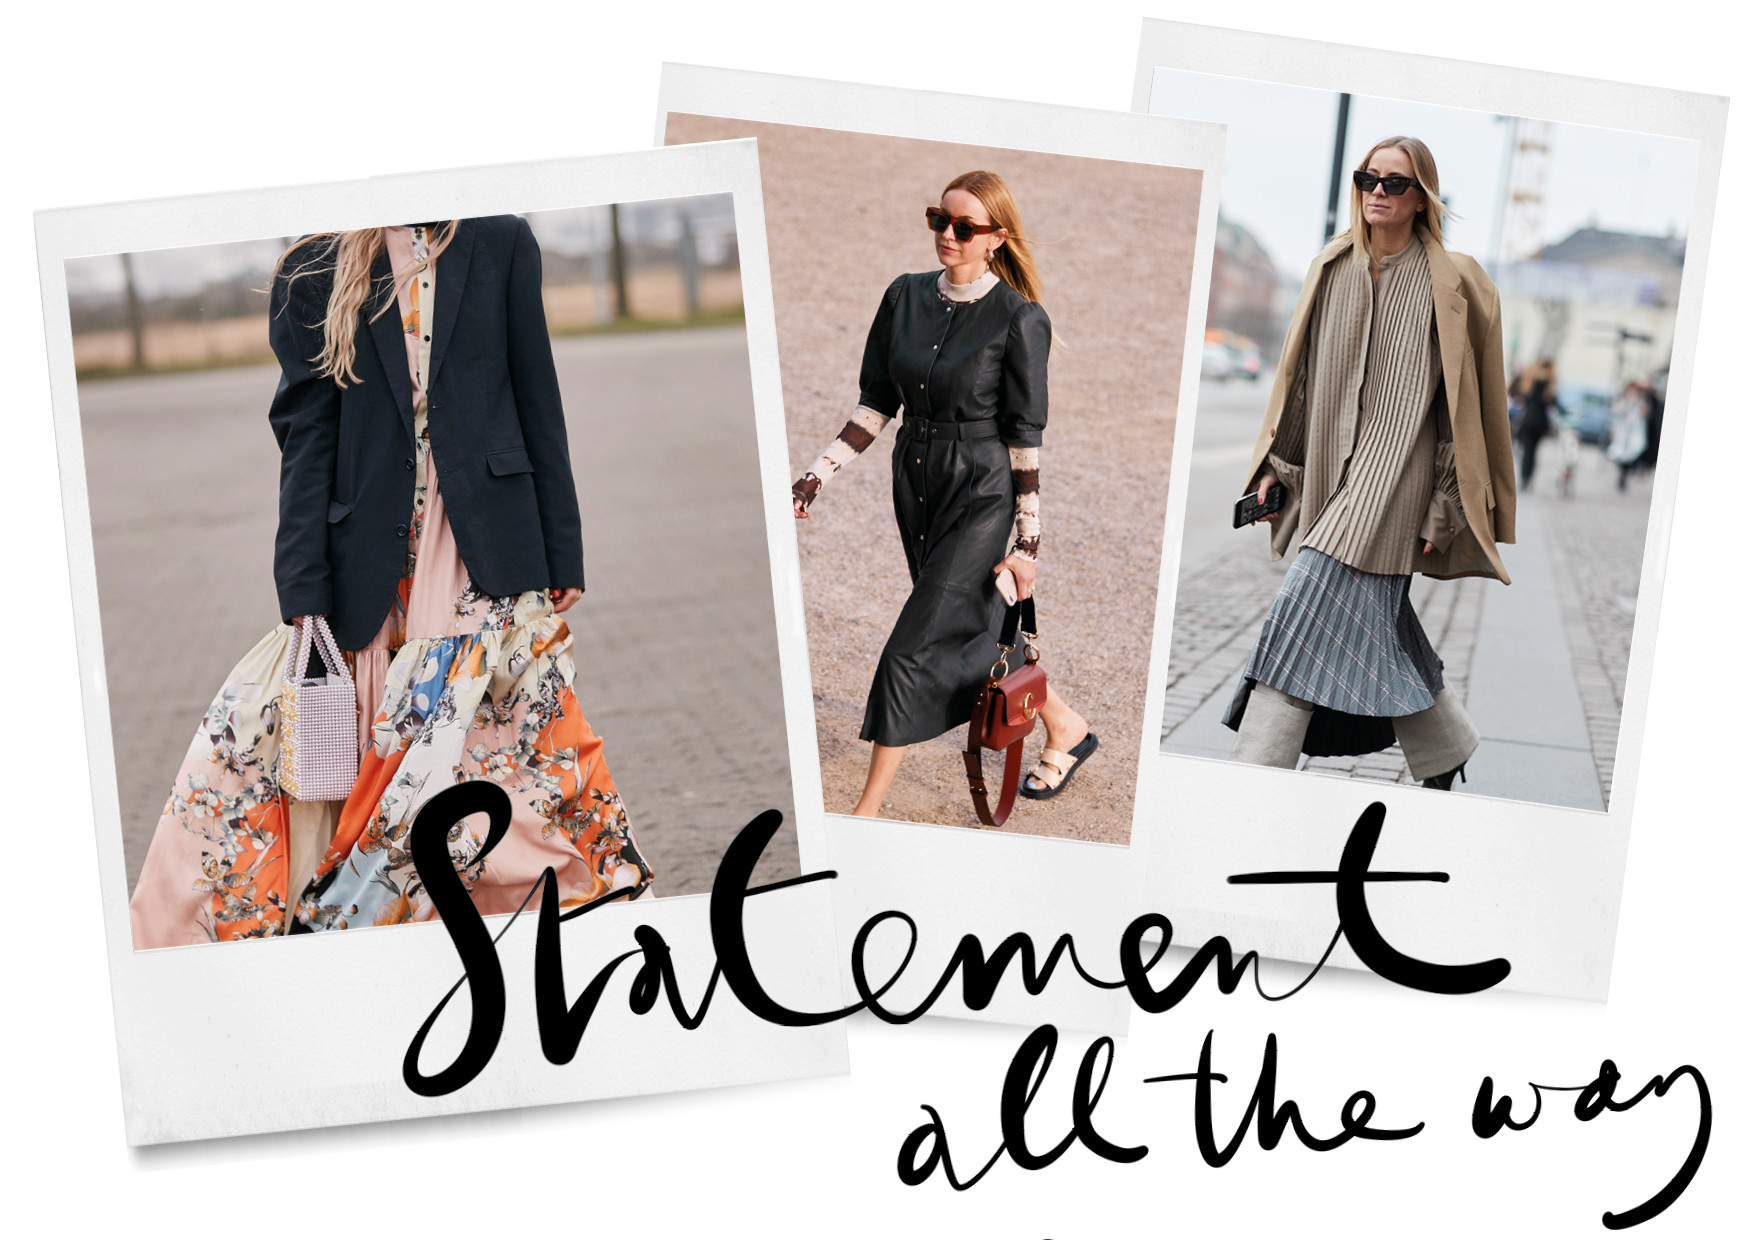 streetstyle beelden. 3 manieren om je zomer jurk te dragen in de winter